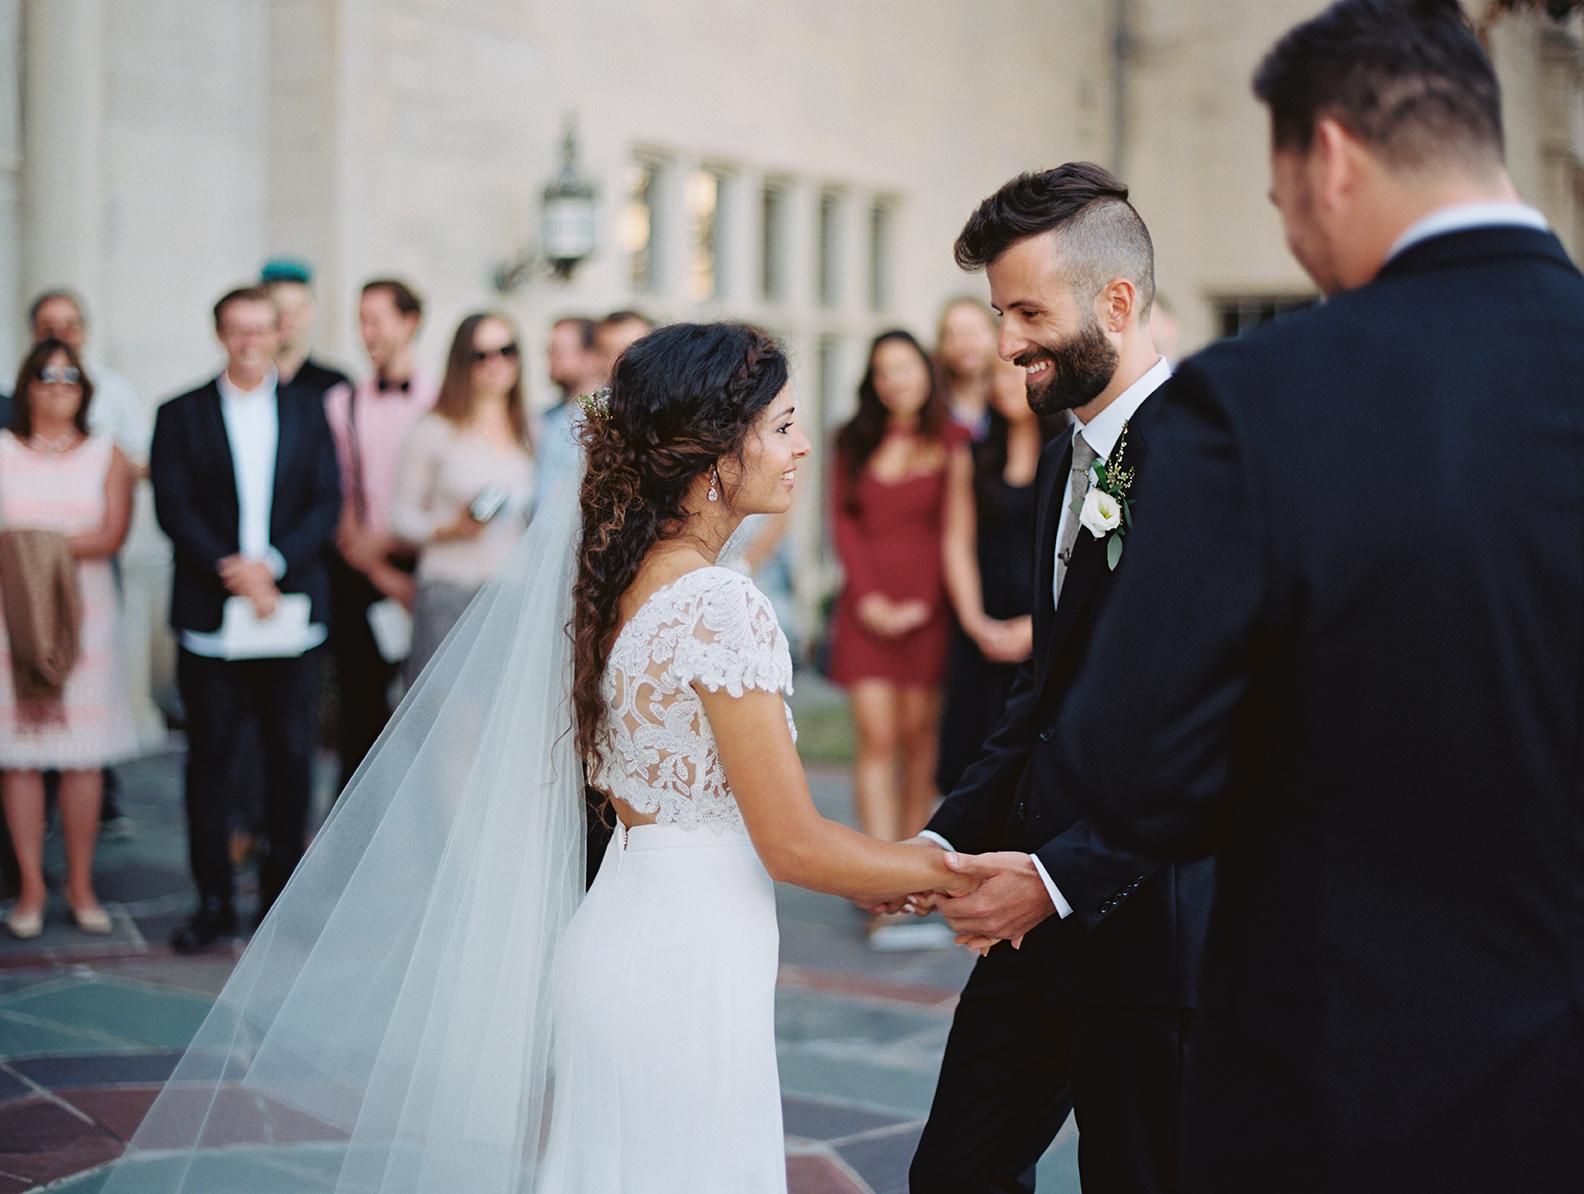 203-brian-sarra-los-angeles-wedding-brumley-wells-photography.jpg